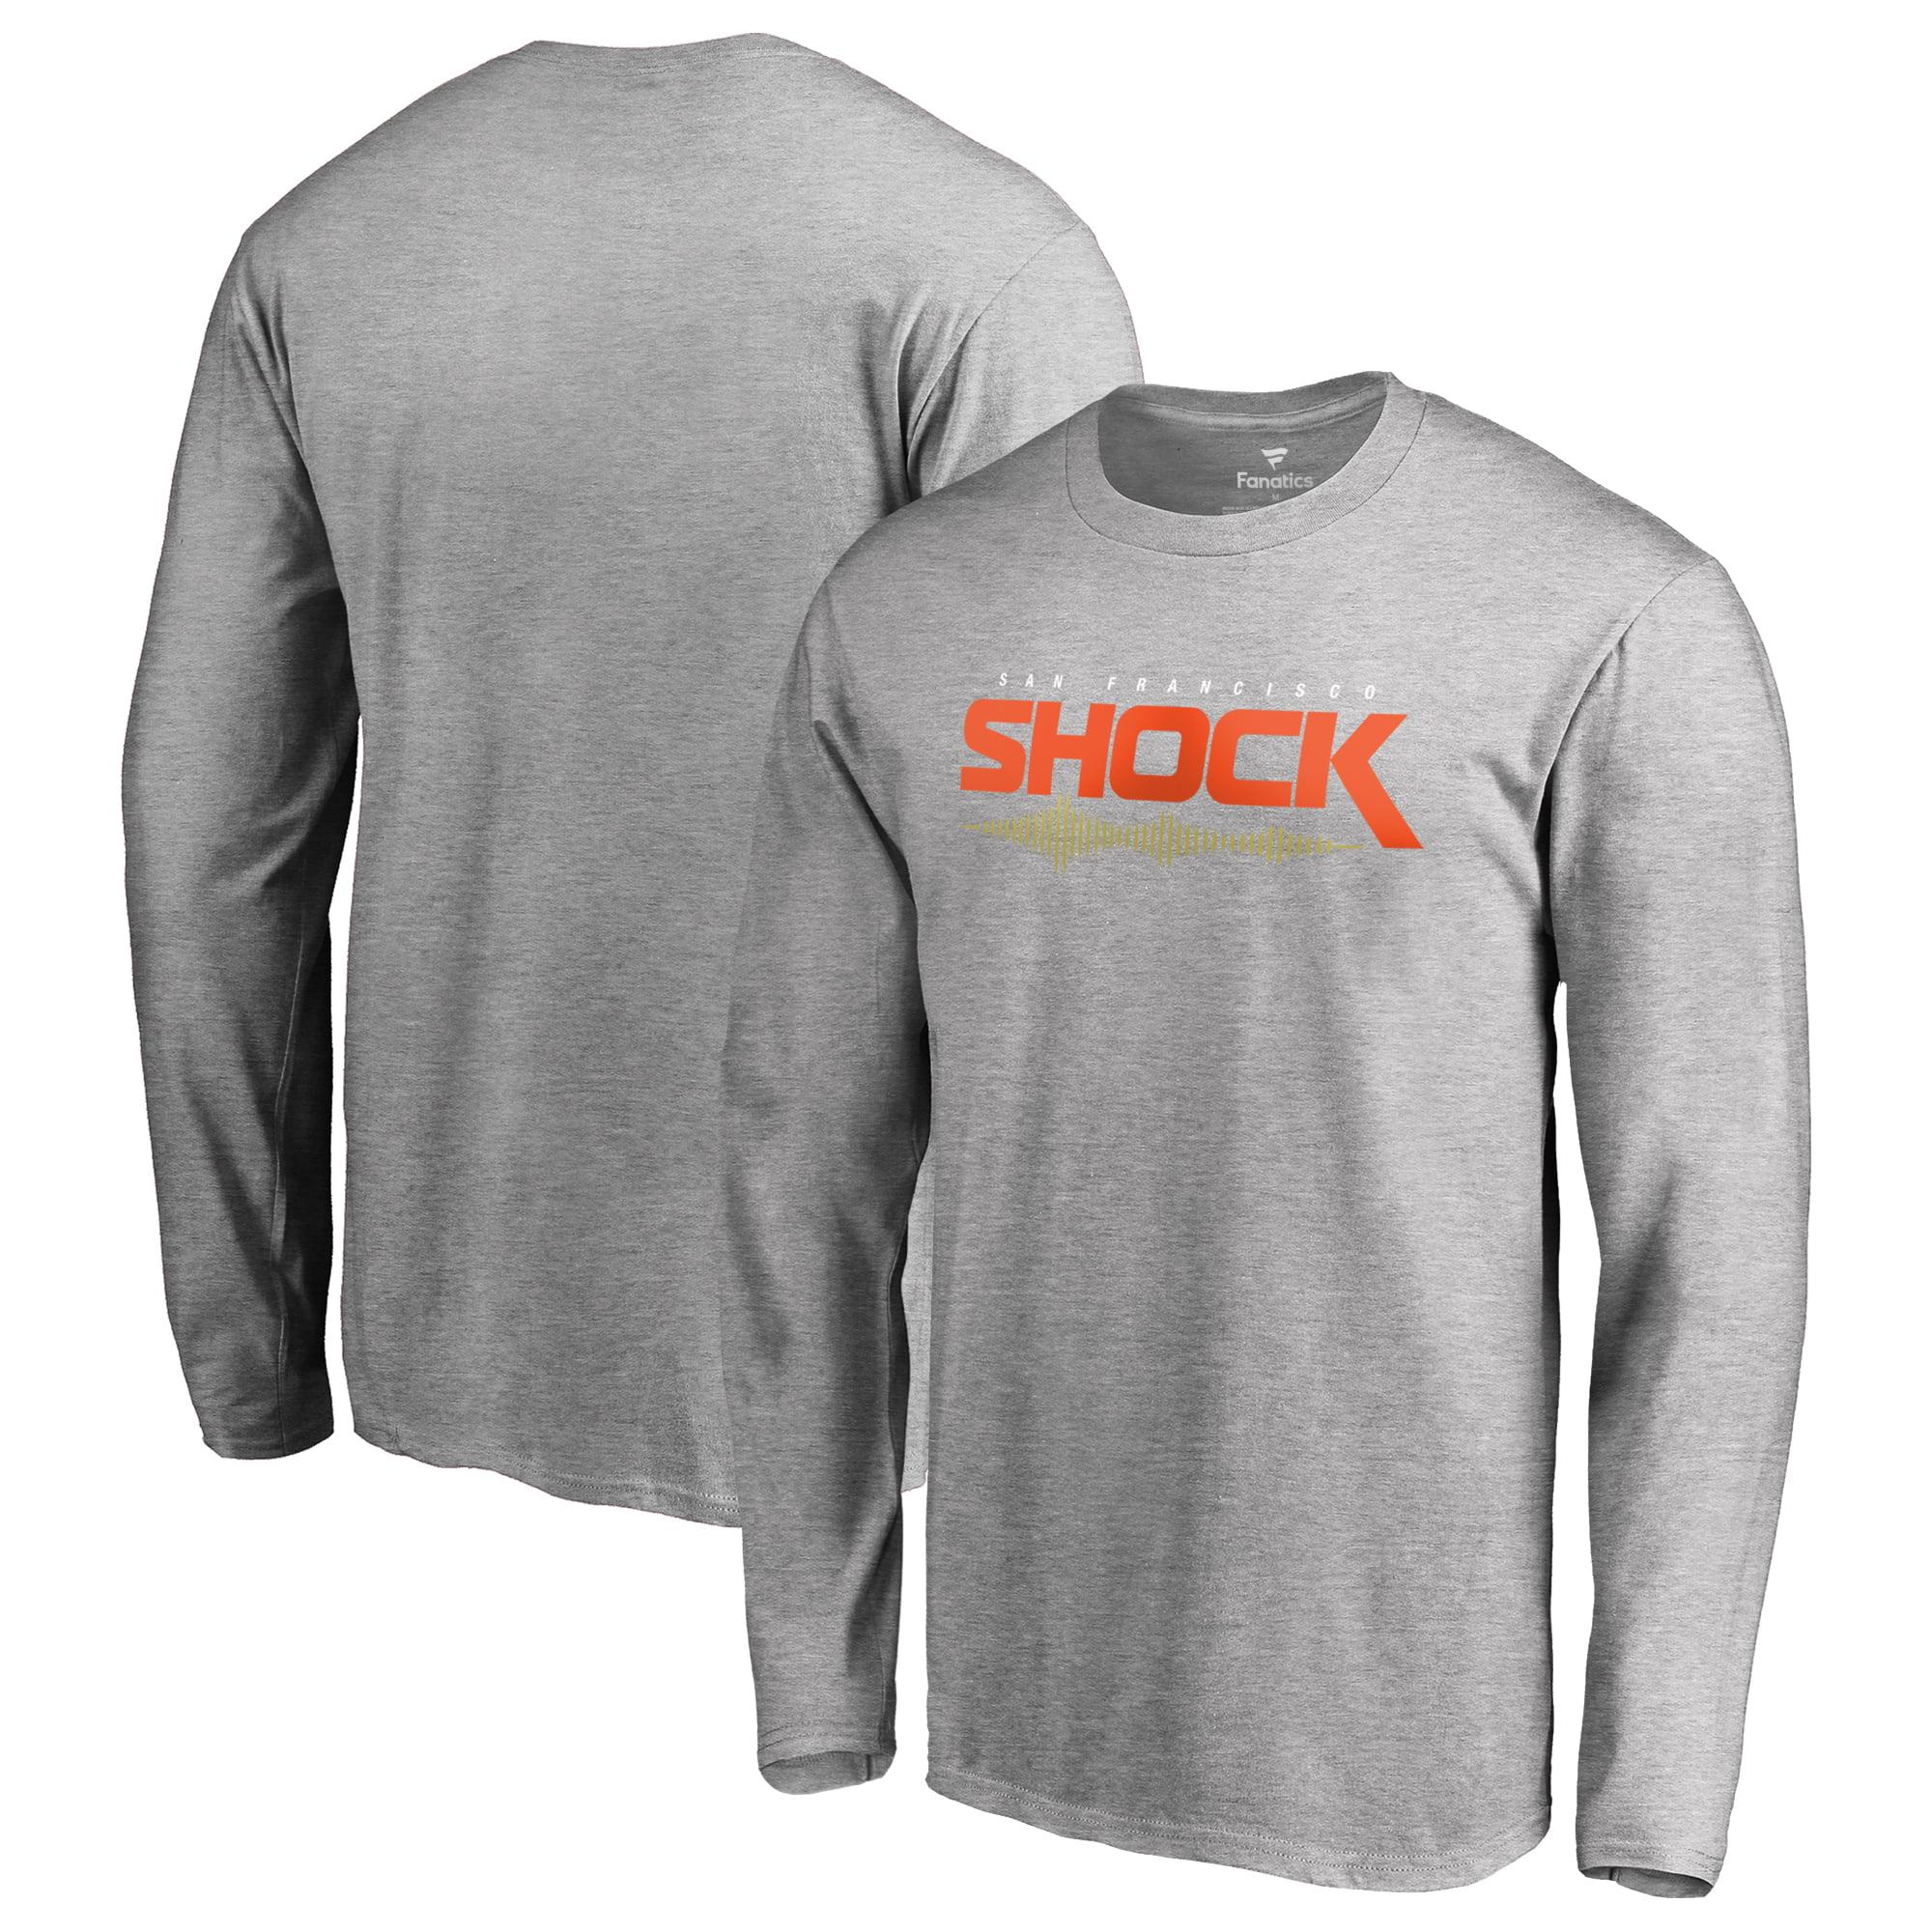 San Francisco Shock Fanatics Branded Team Identity Long Sleeve T-Shirt - Heather Gray